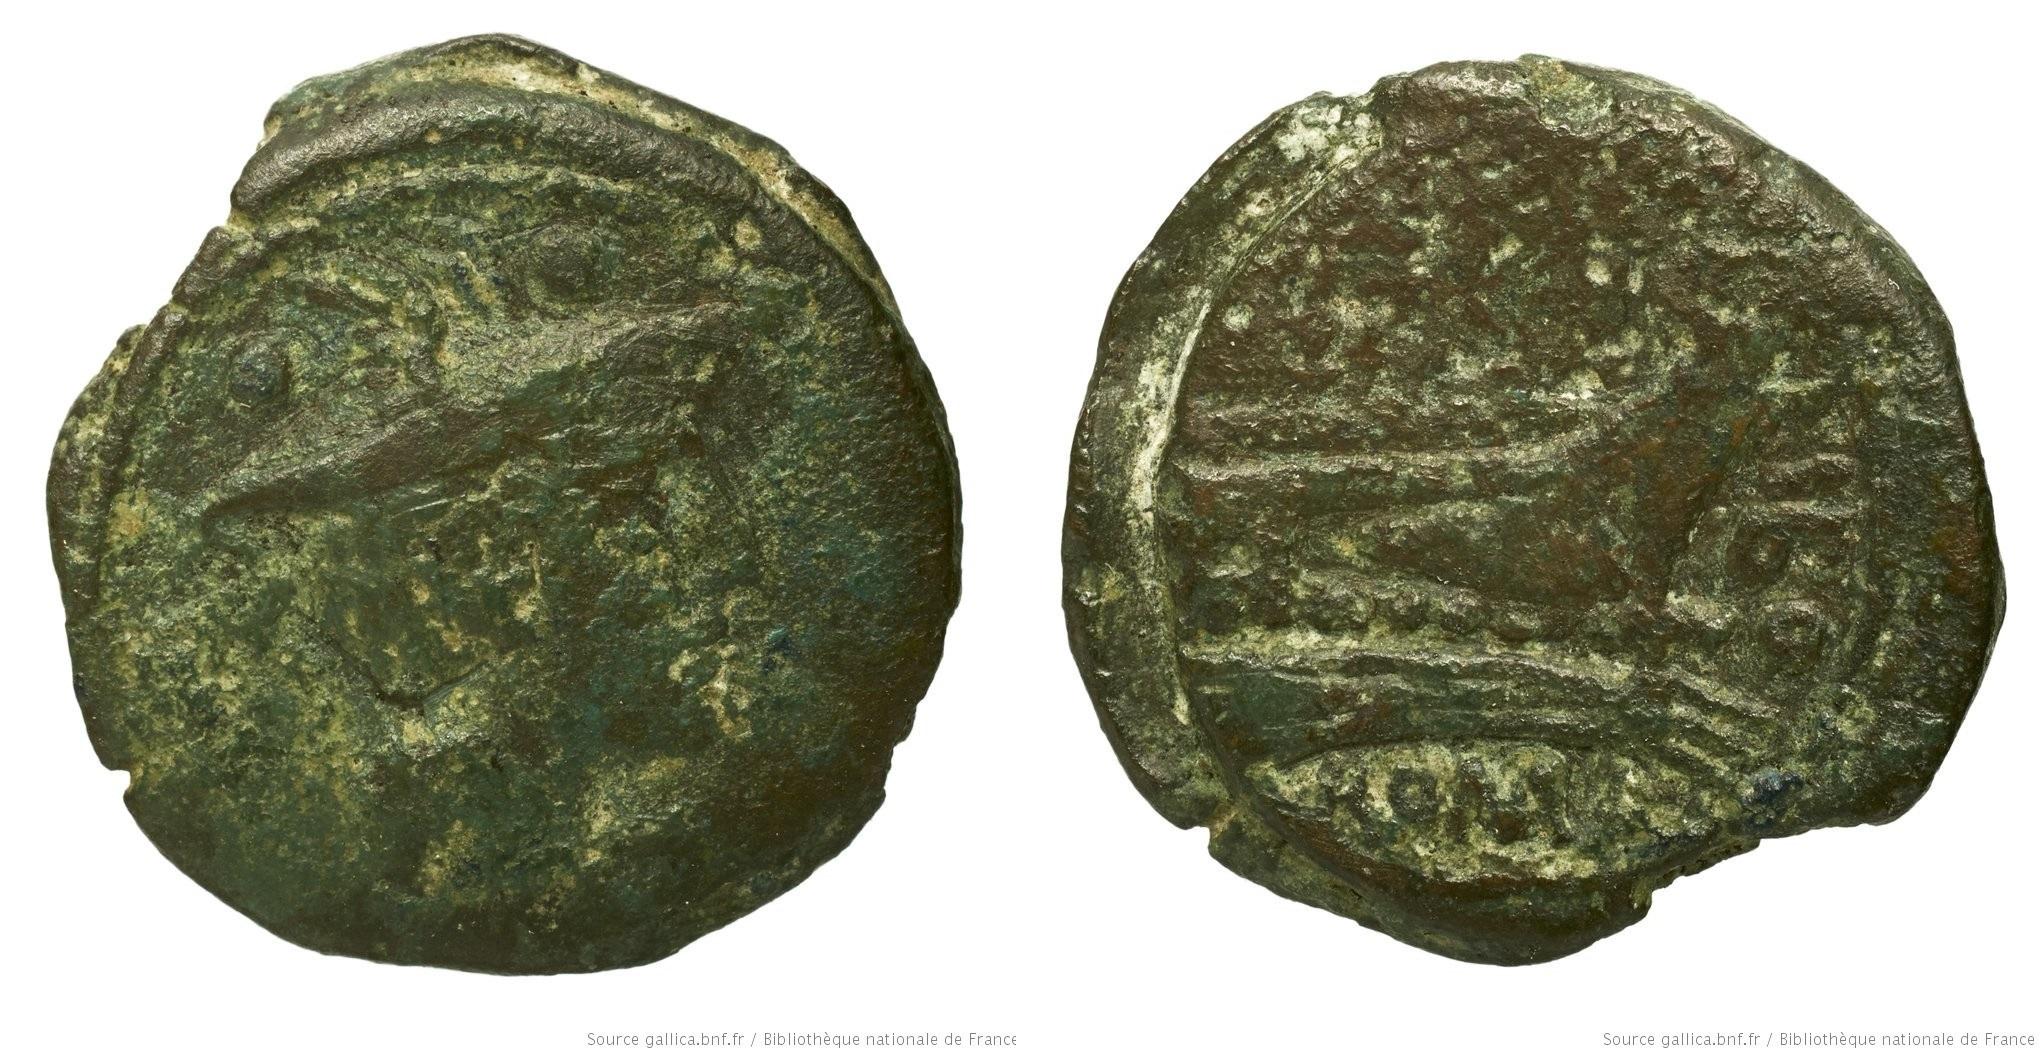 876MA – Sextans Marcia – Quintus Marcius Libo